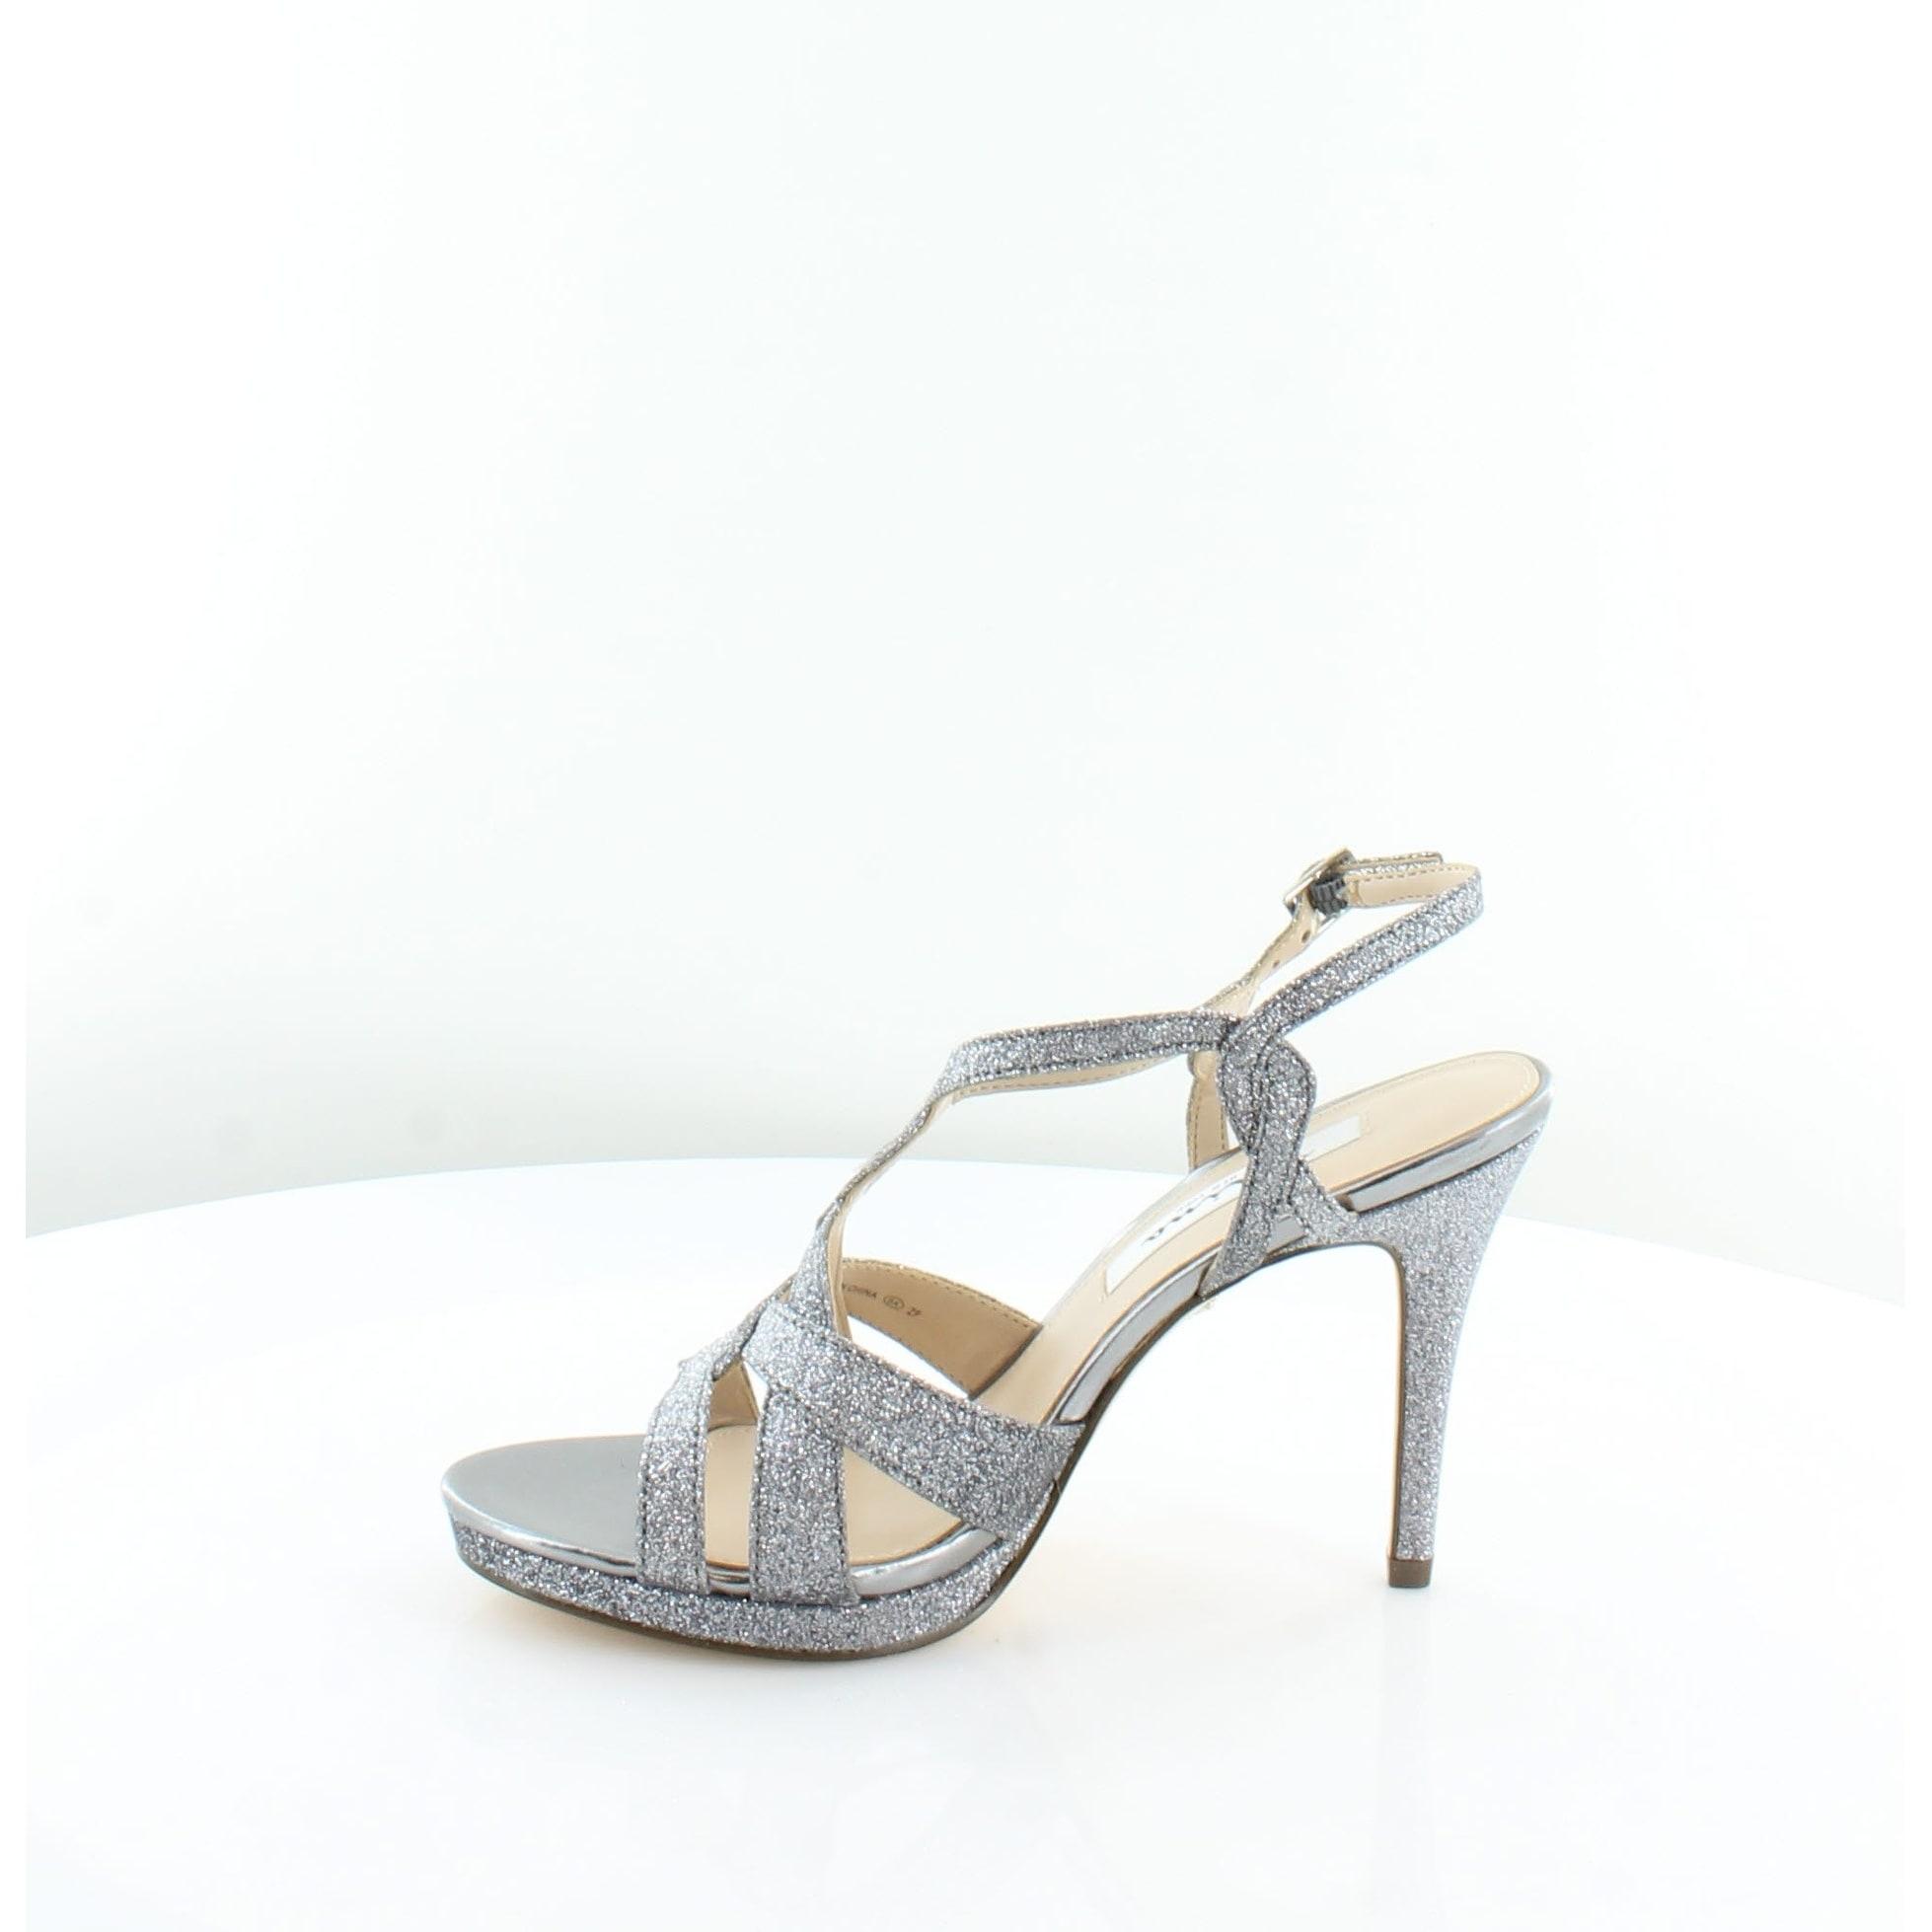 90b63eb0f Shop Nina Raeni Women s Sandals Pewter Baby Glitter - 7 - Free Shipping  Today - Overstock.com - 22411004